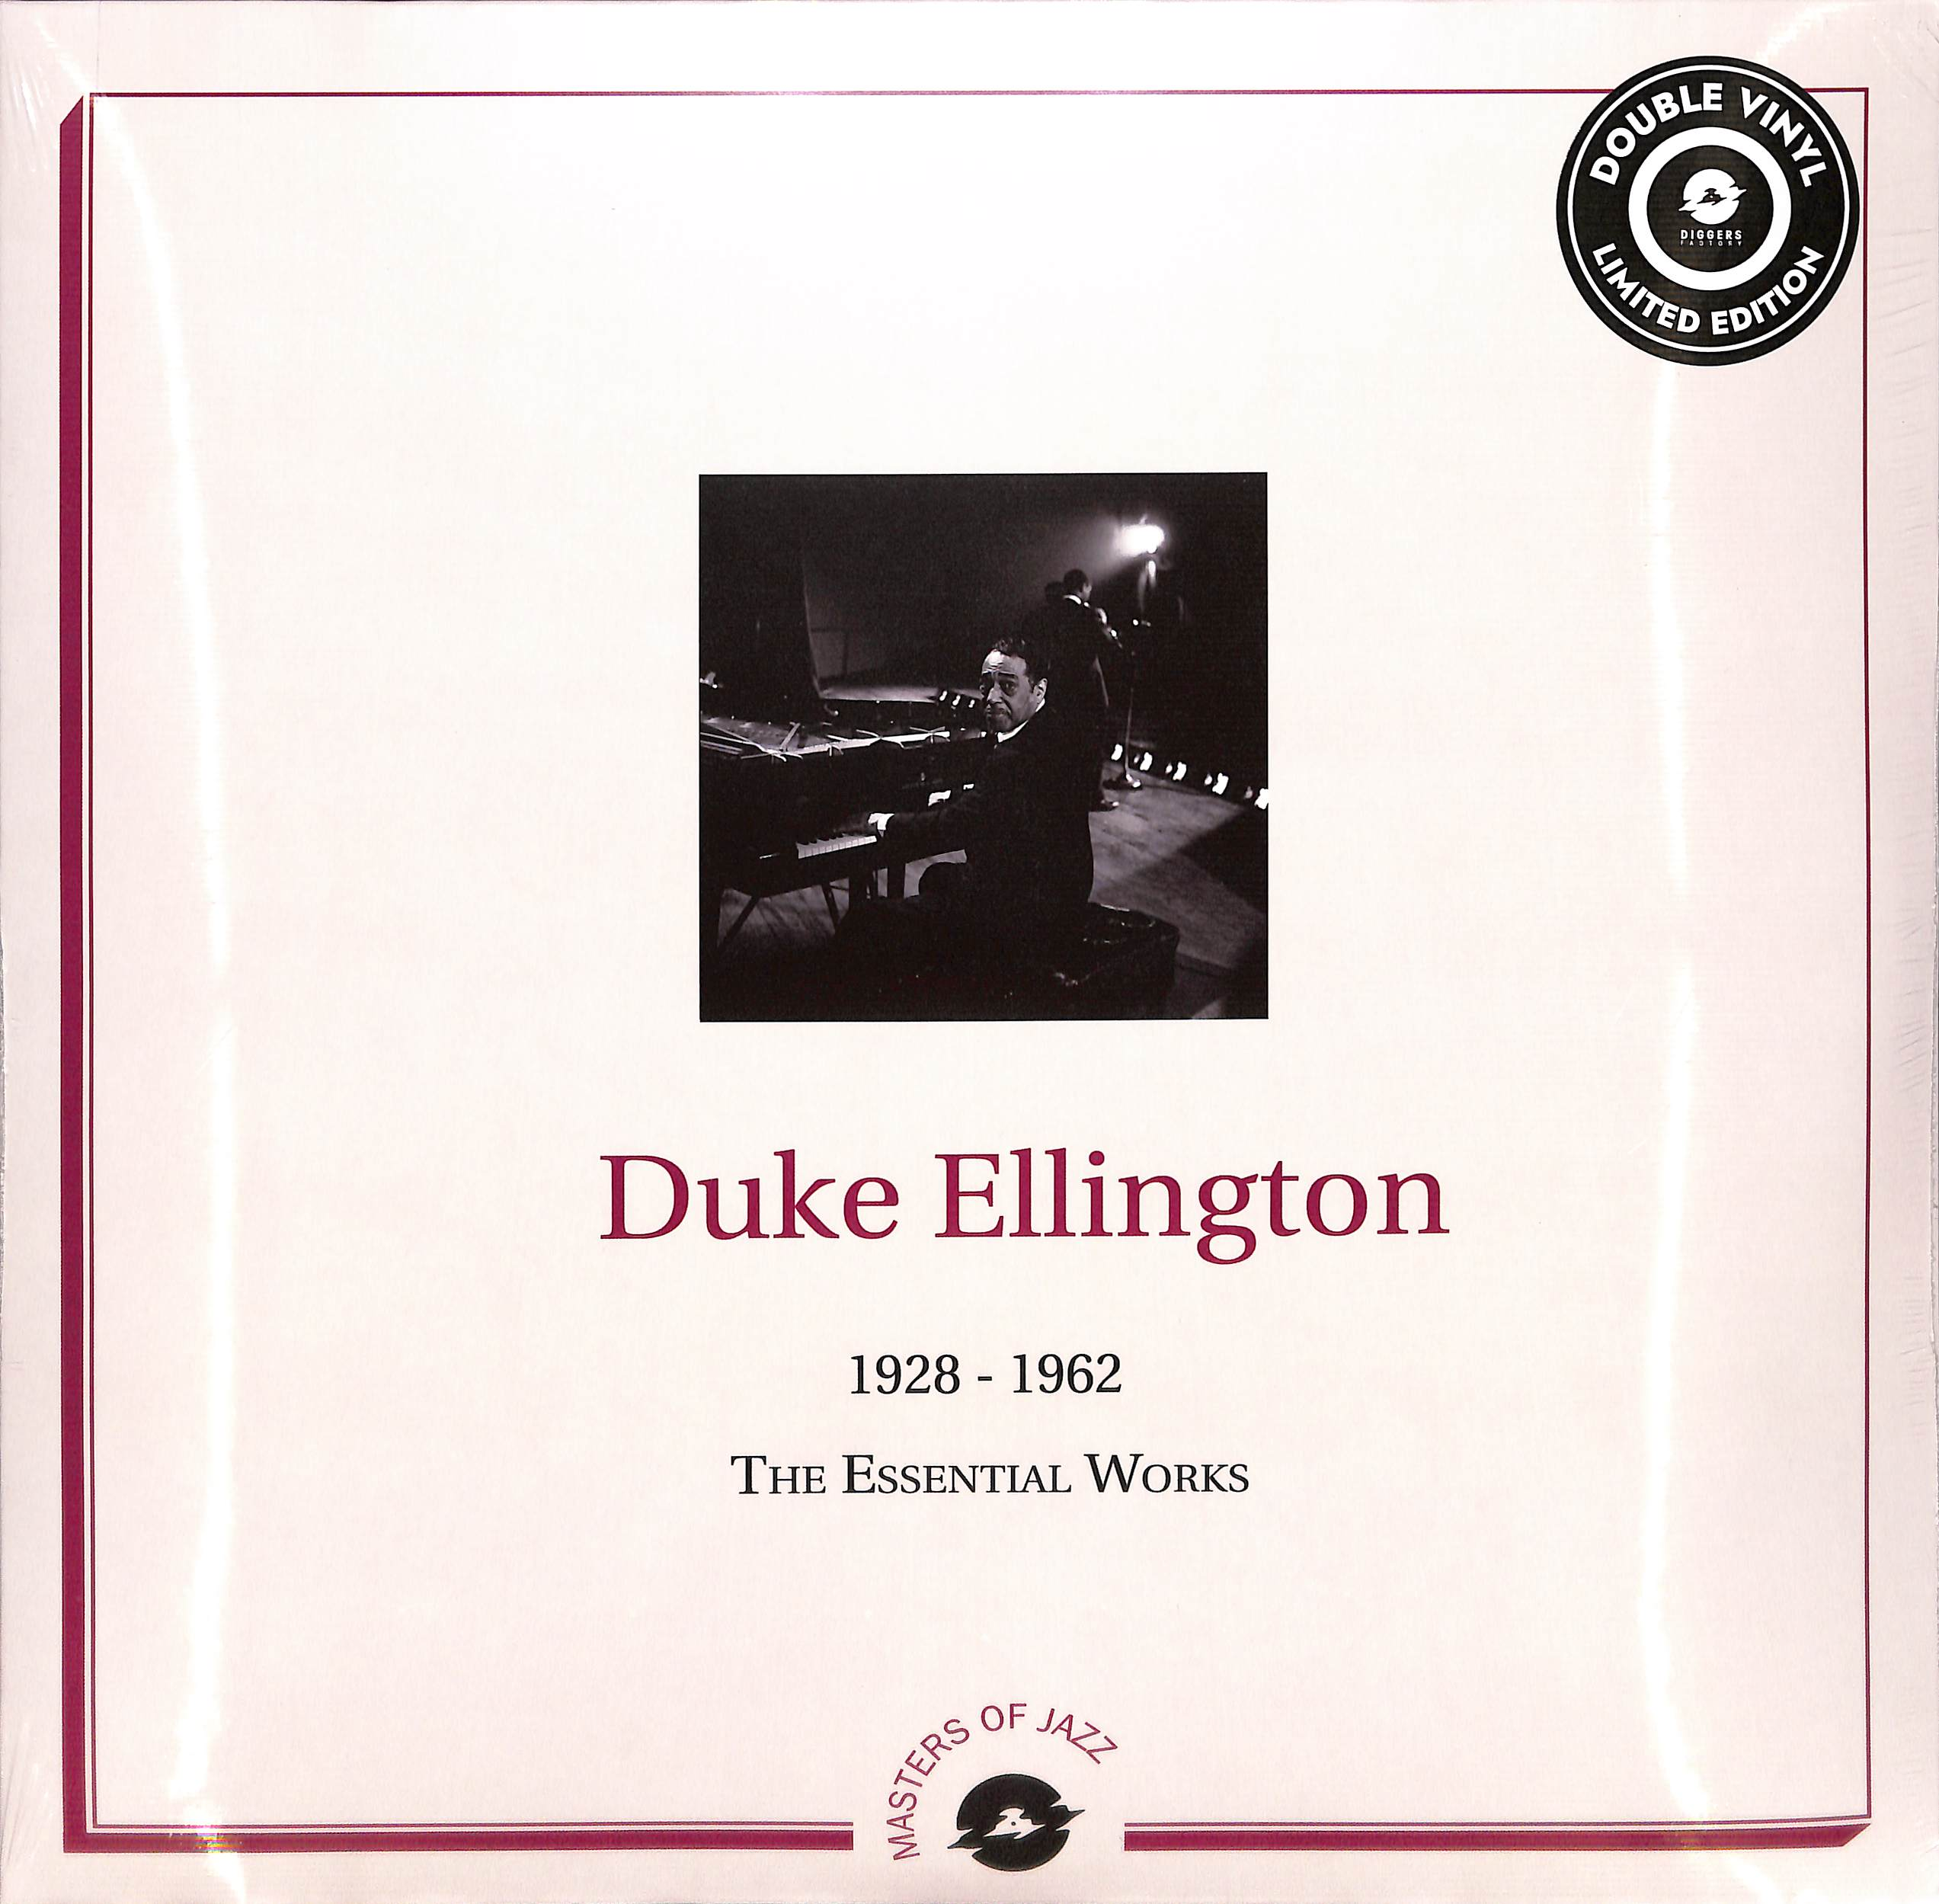 Duke Ellington - THE ESSENTIAL WORKS 1928-1962